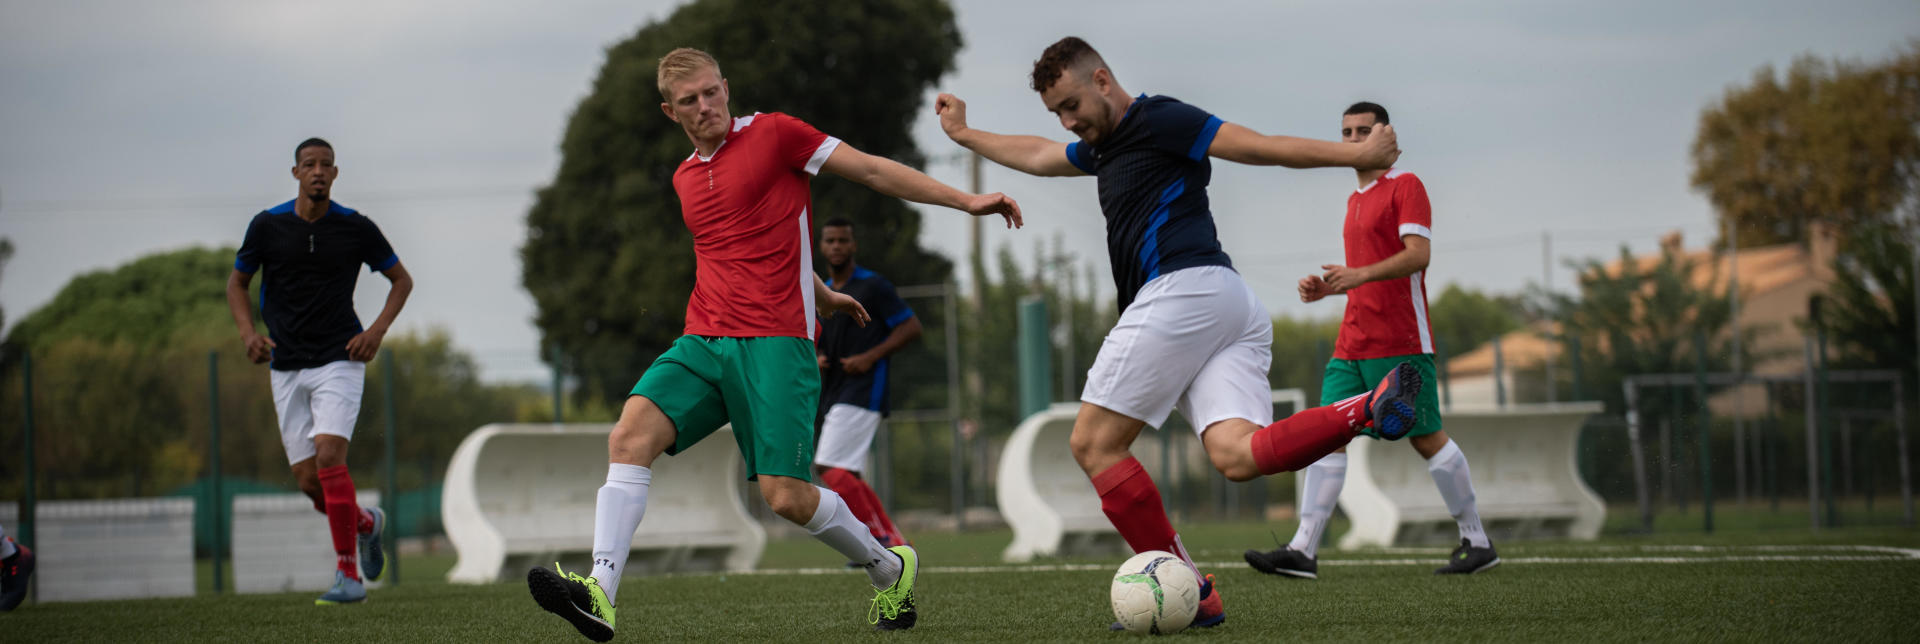 divisions-football